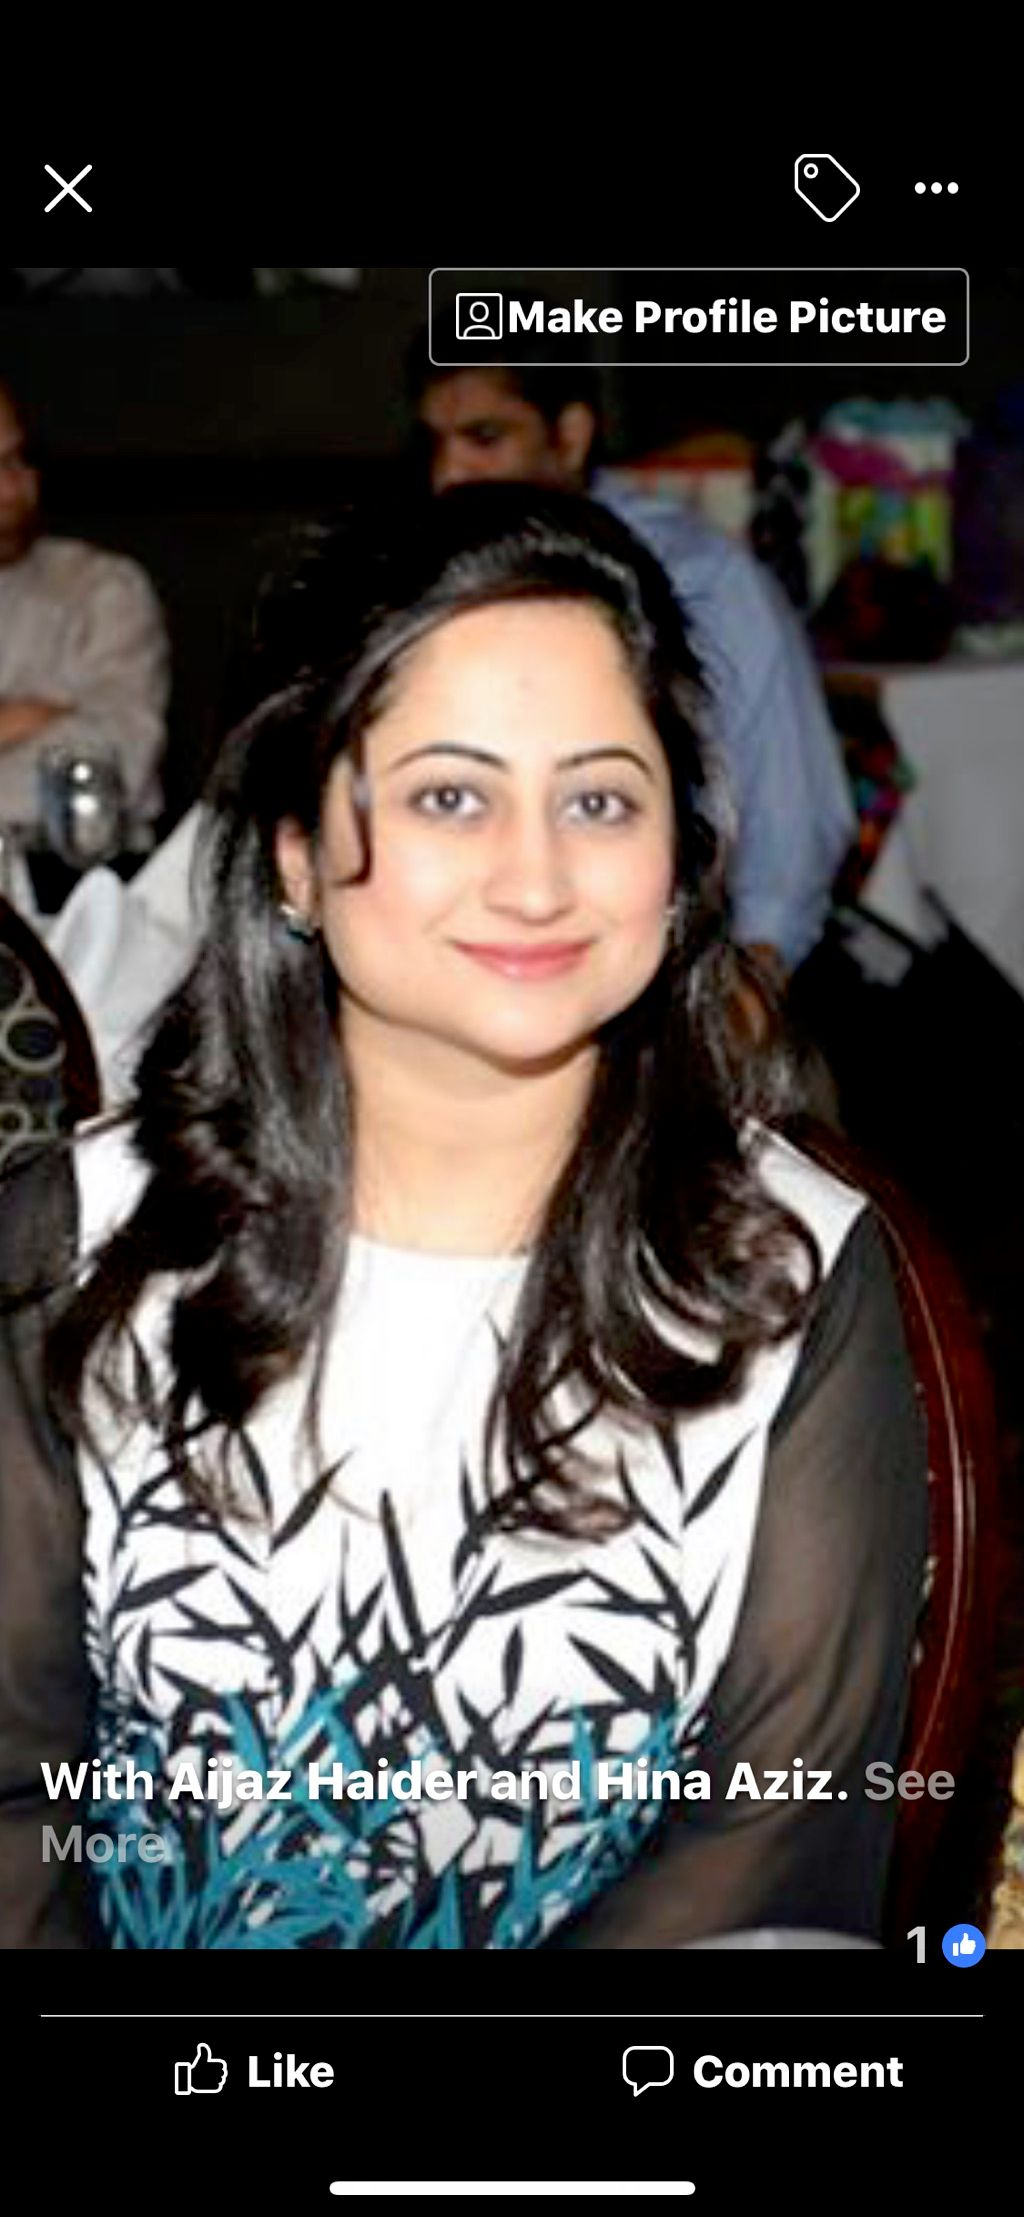 Hina Aziz